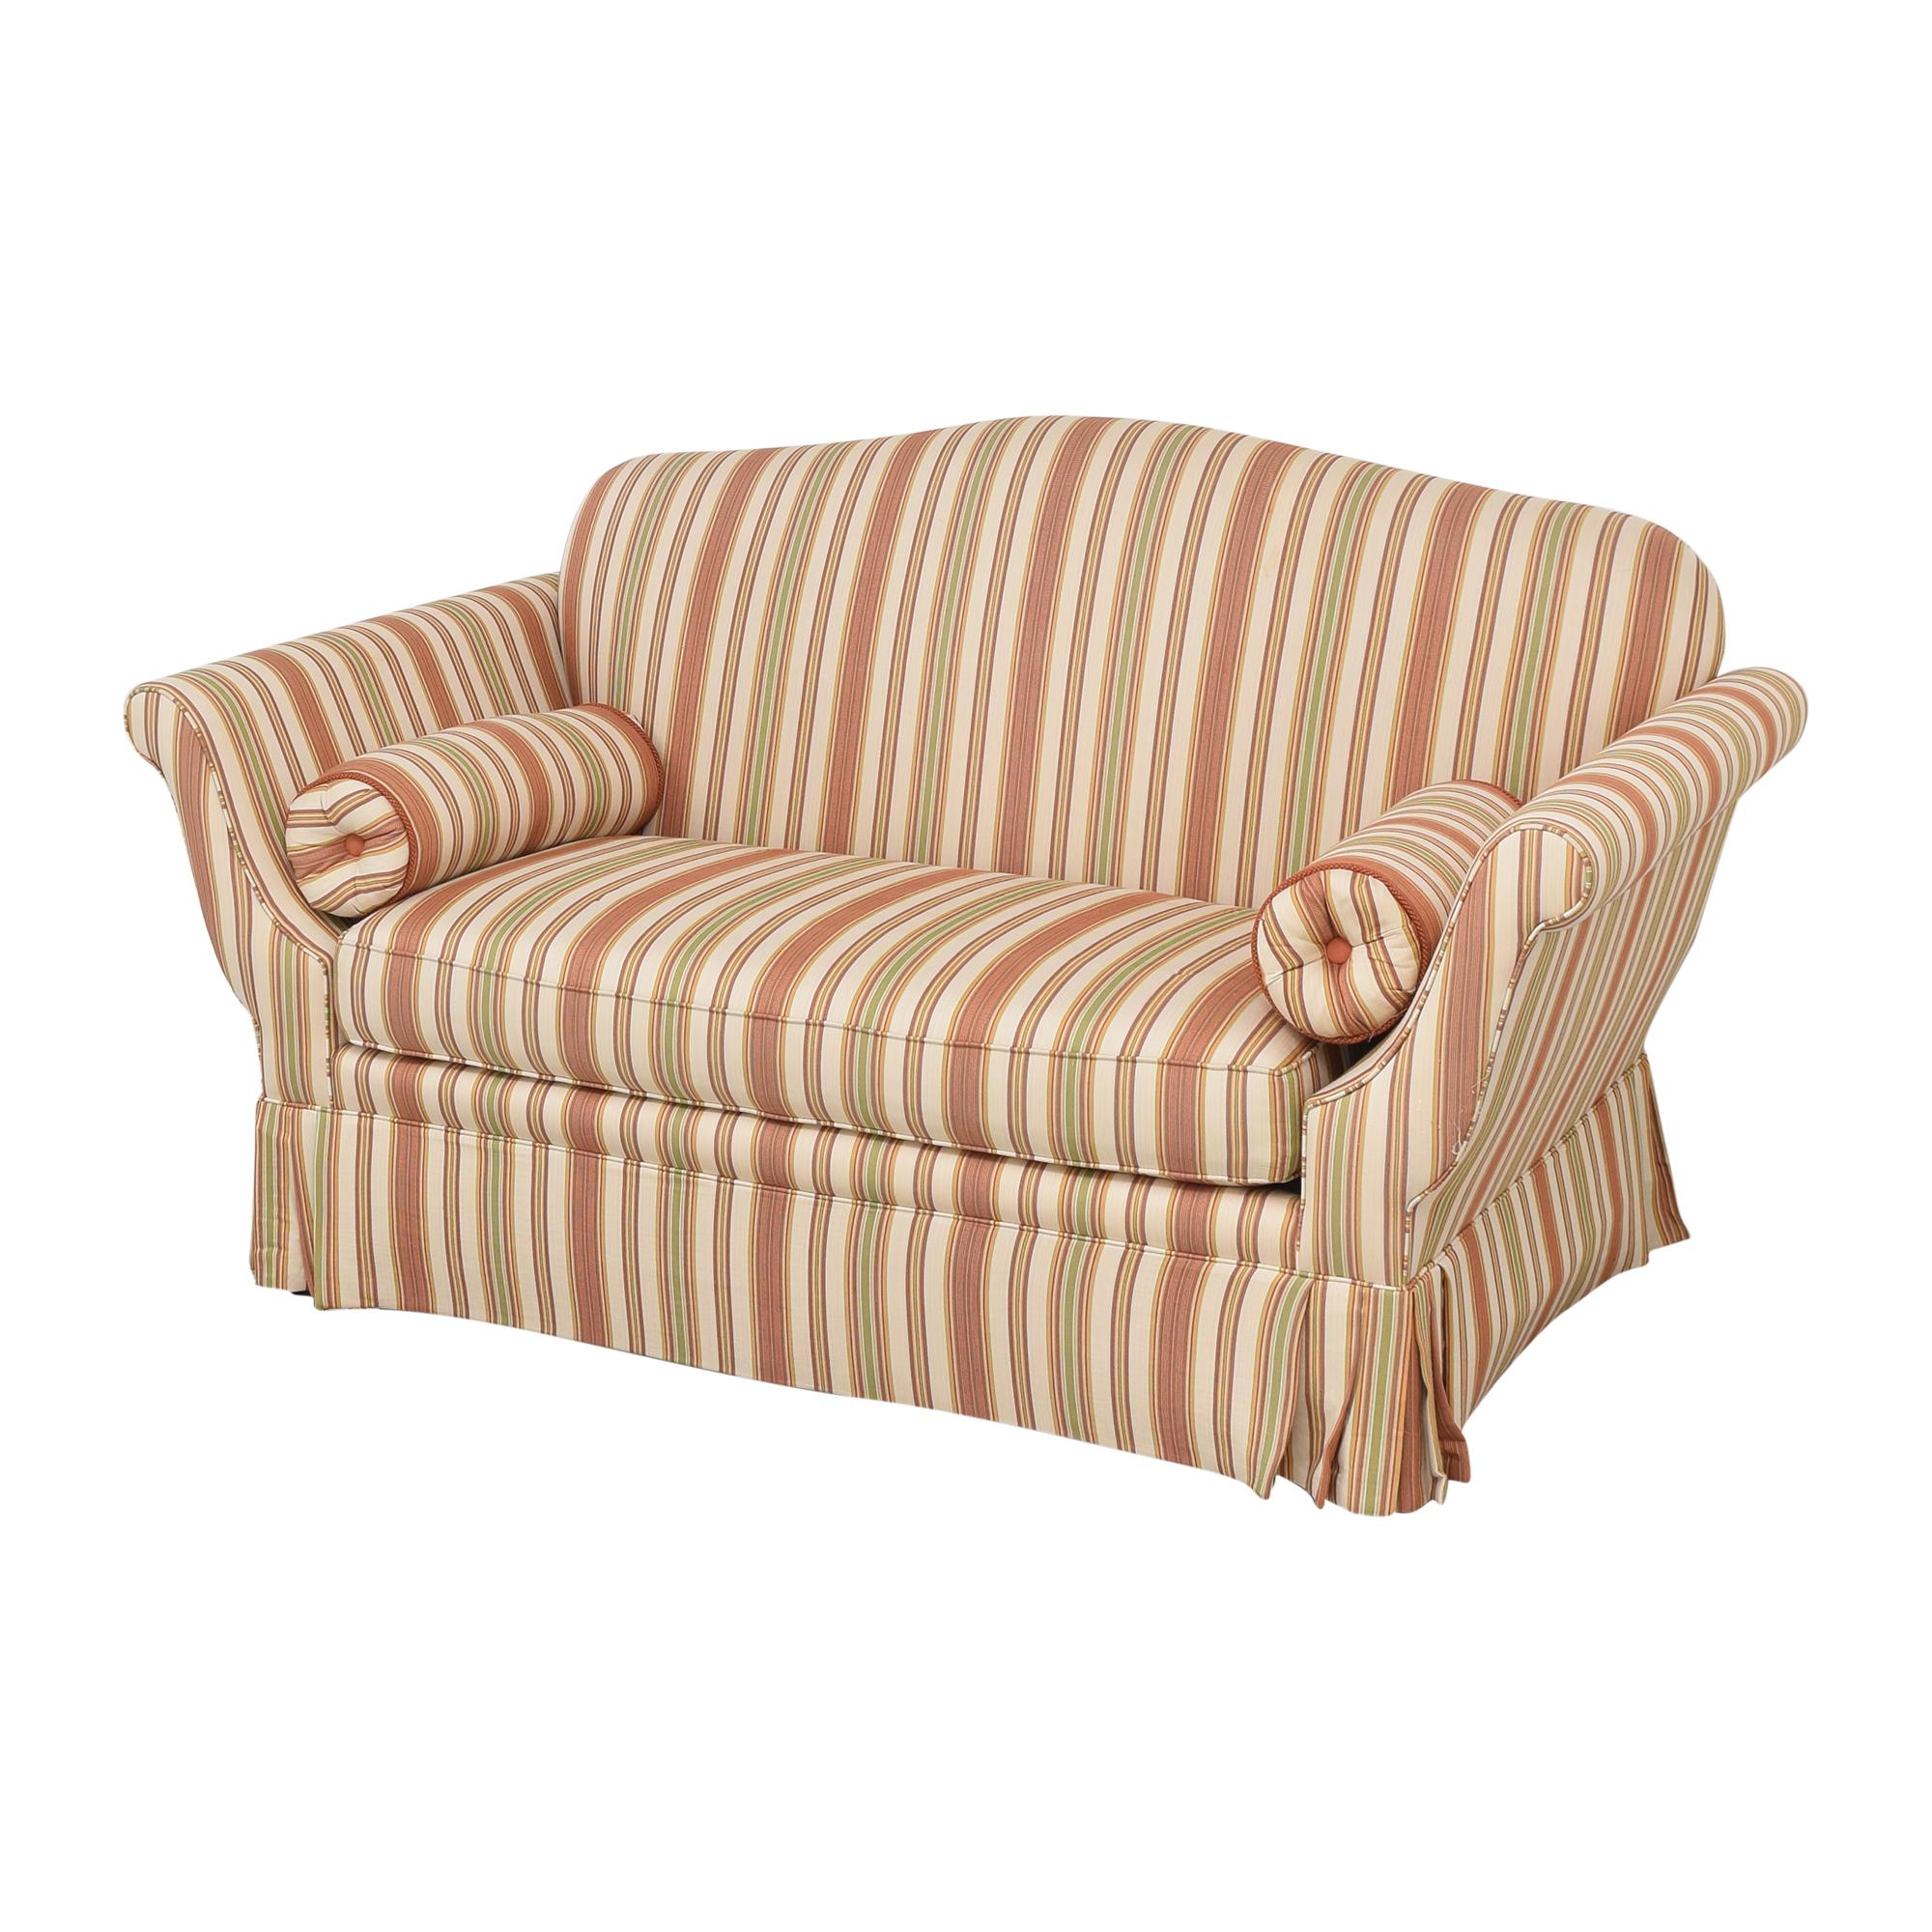 shop Taylor King Taylor King Camelback Bench Cushion Sofa online